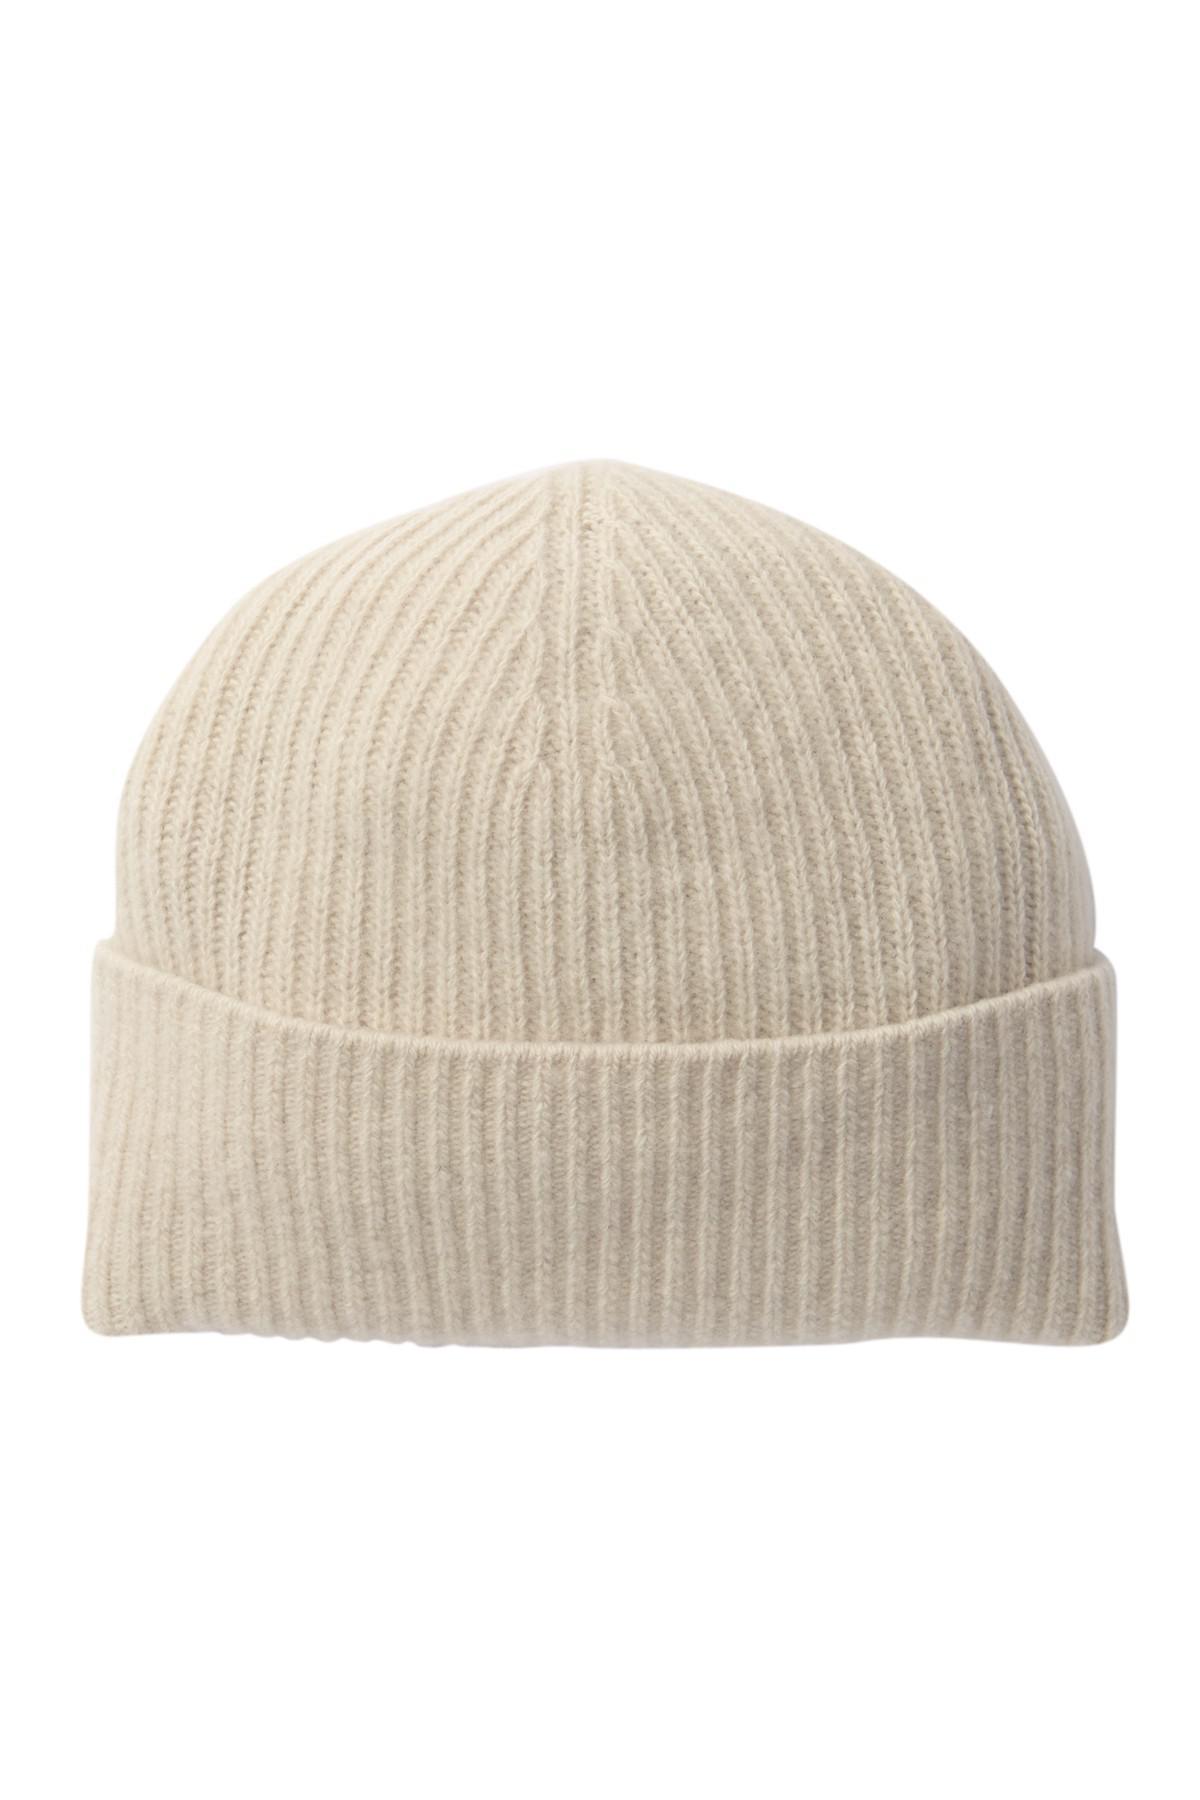 aab246d2d40 Portolano. Women s Ribbed Cashmere Hat